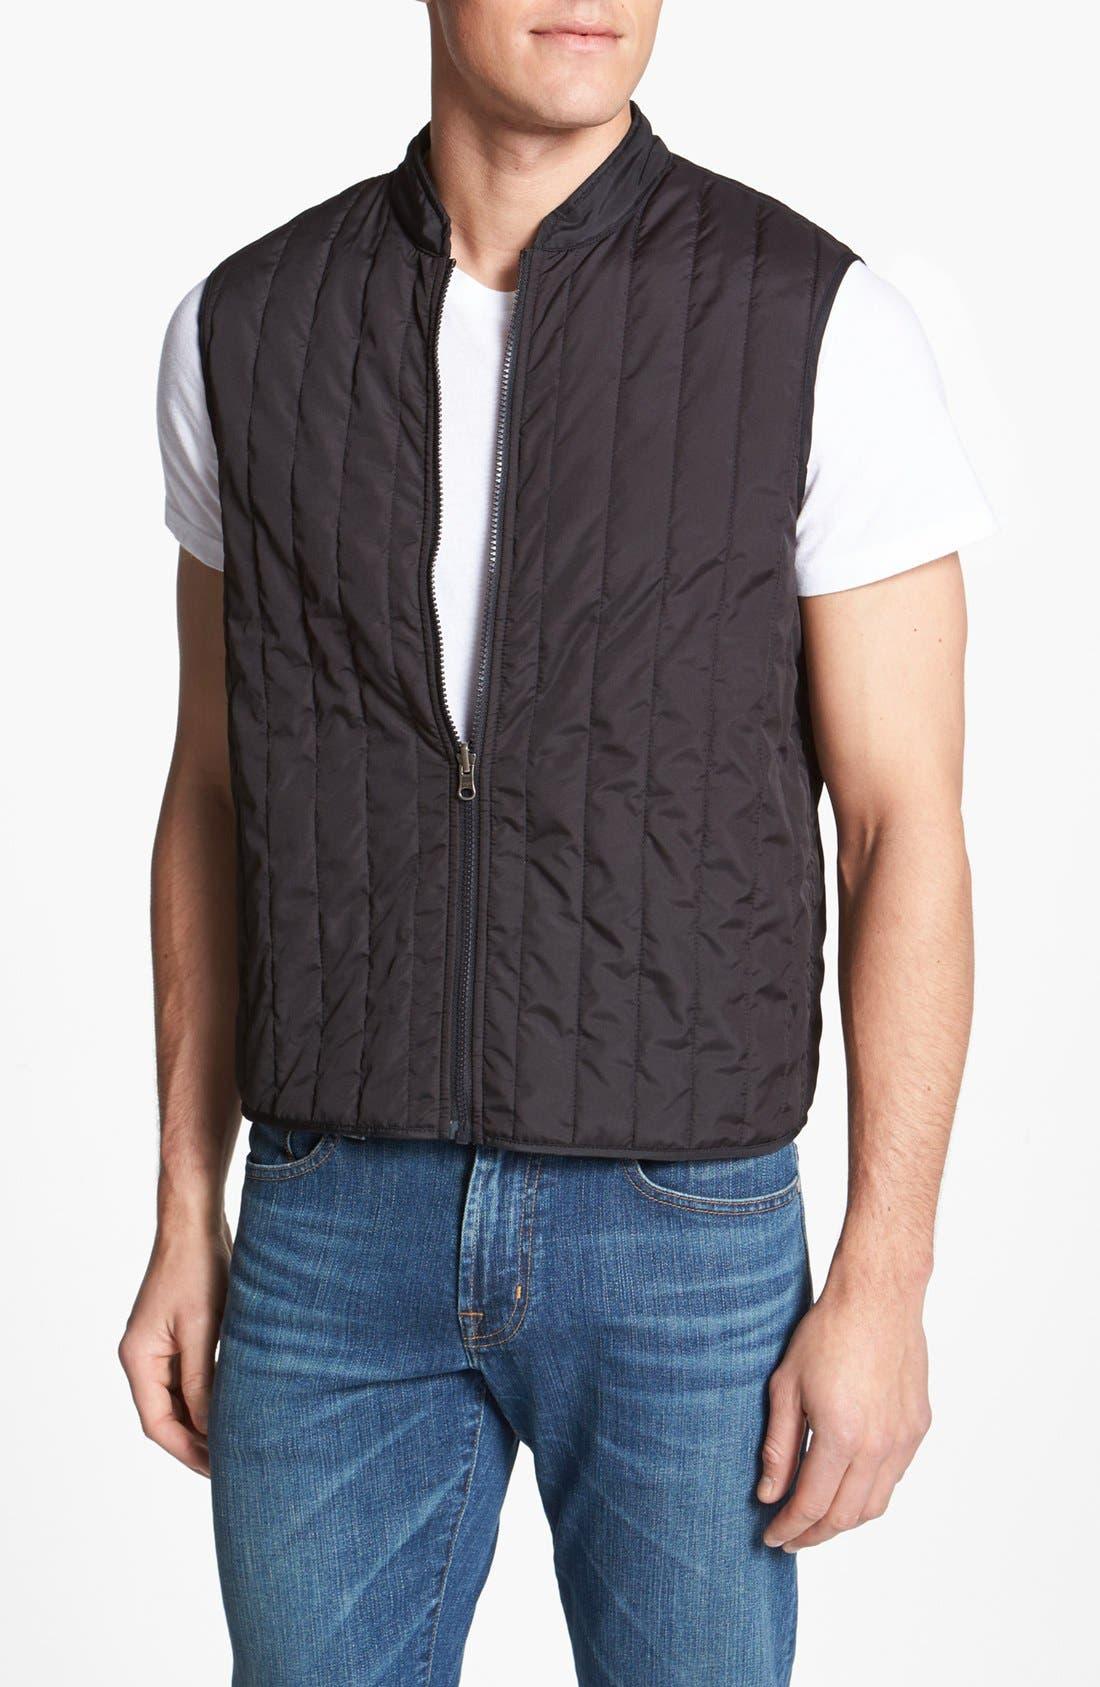 Alternate Image 3  - Michael Kors Trim Fit 3-in-1 Jacket